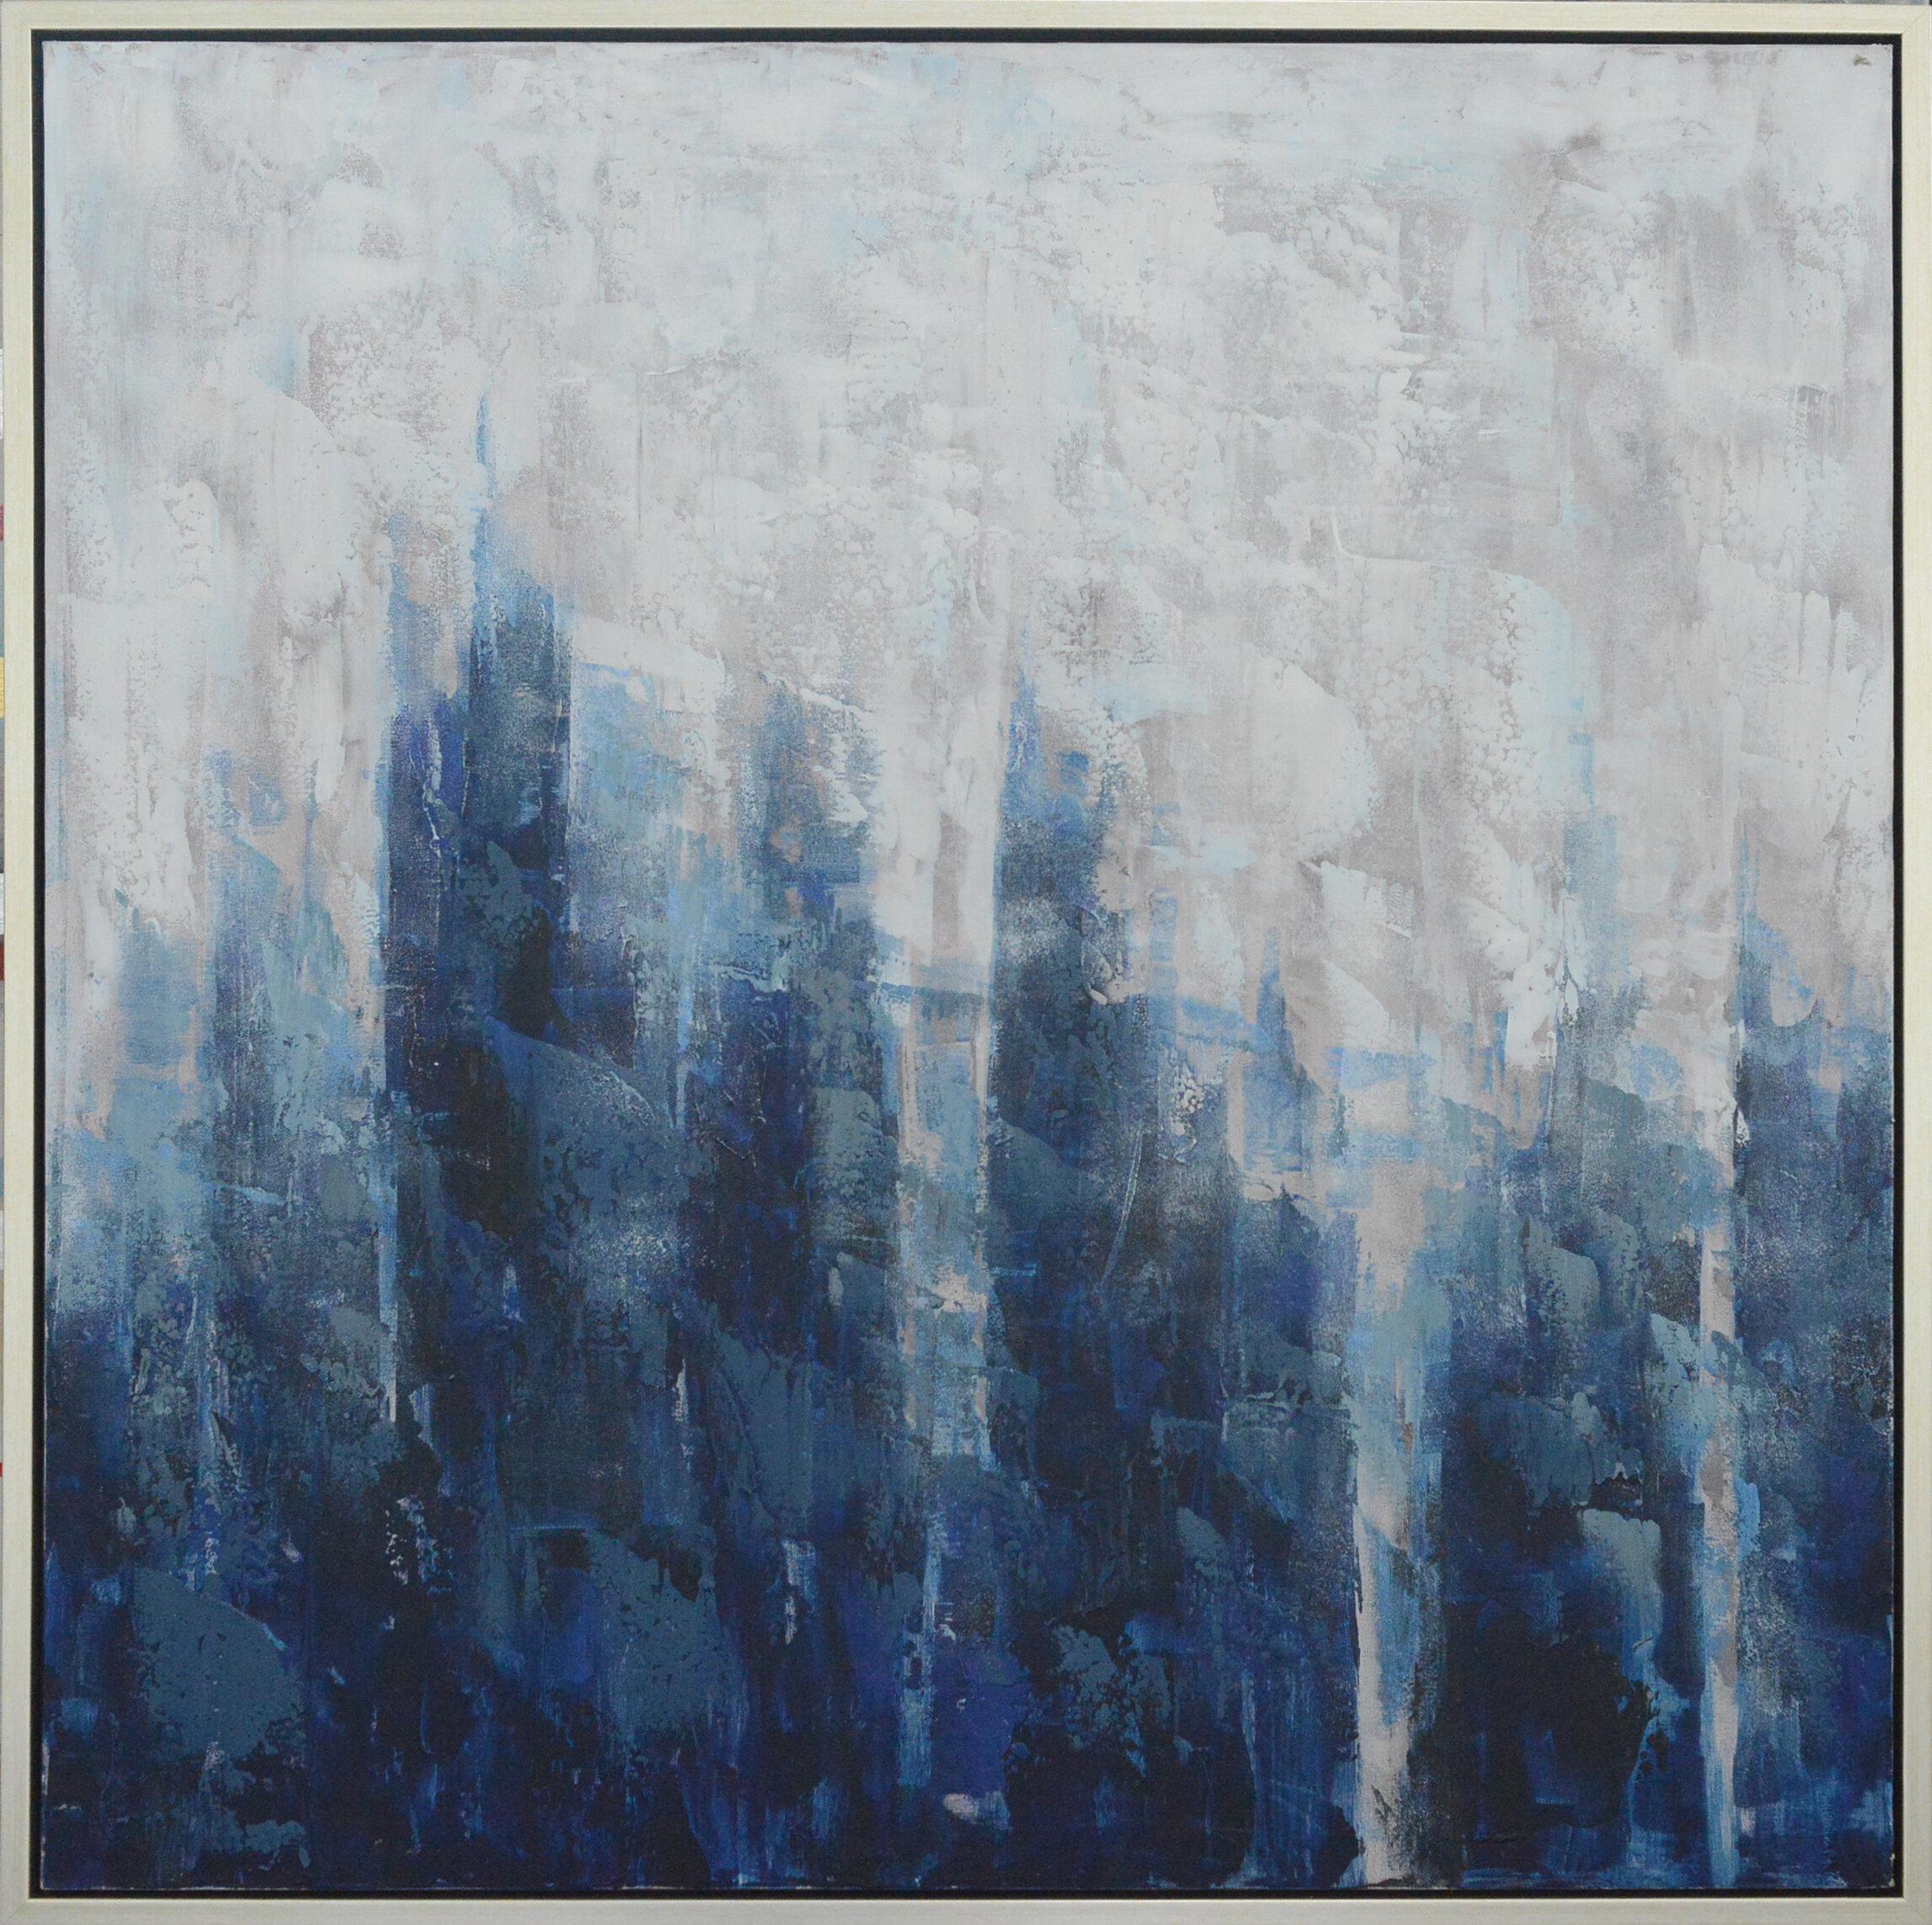 Mercer41 Hanging Framed Oil Painting Print On Canvas Reviews Wayfair